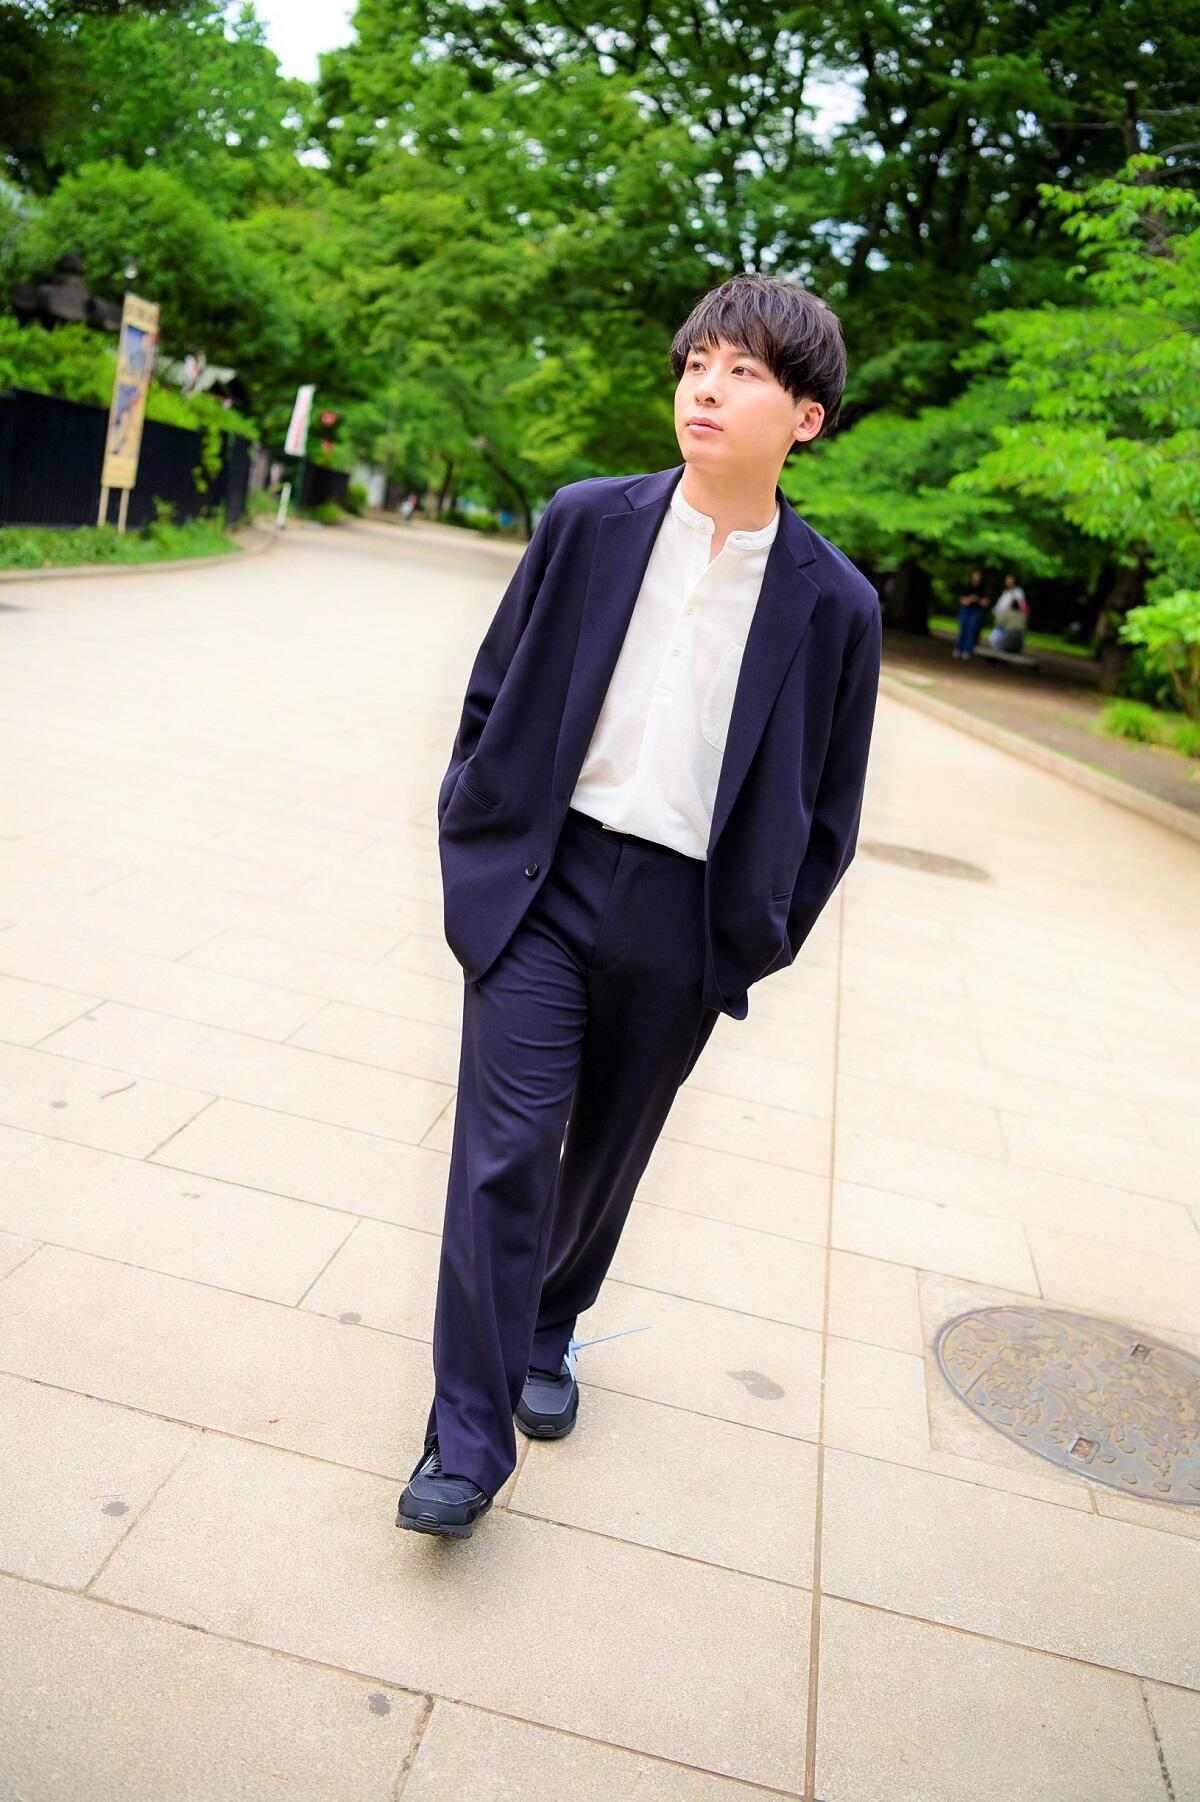 20190630_oshidan_06.jpg